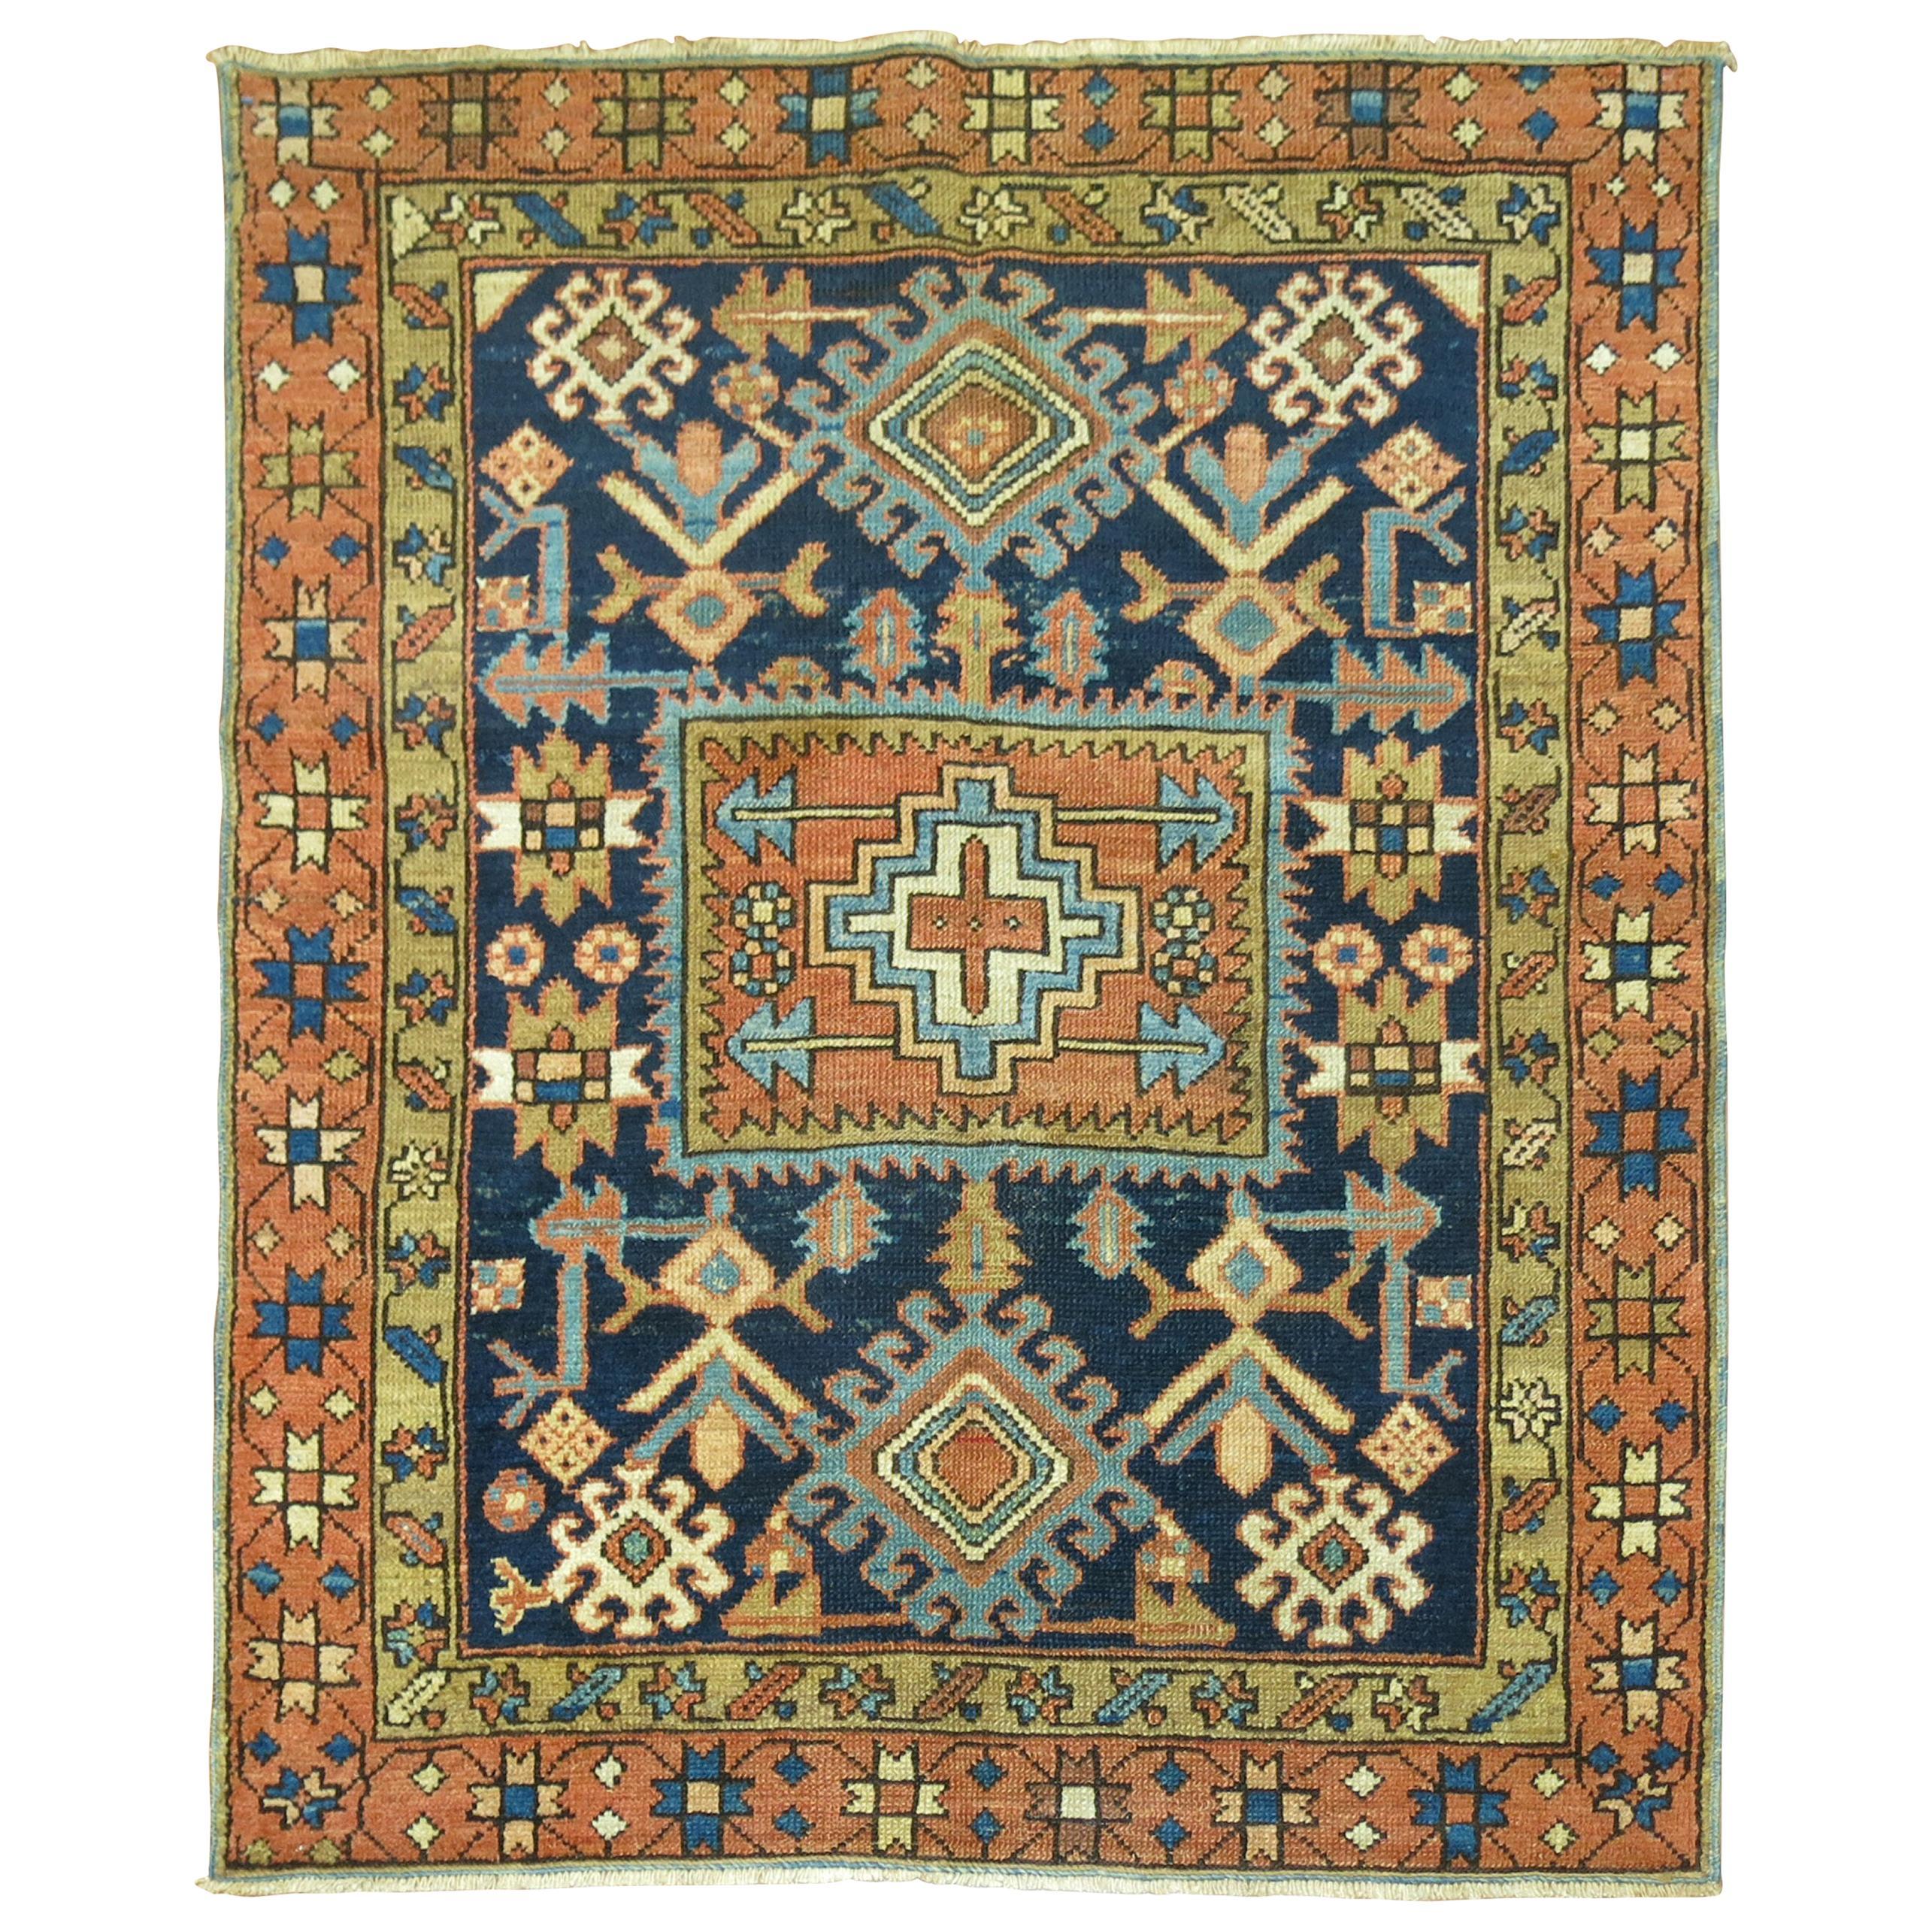 Antique Persian Square Navy Blue Heriz Rug